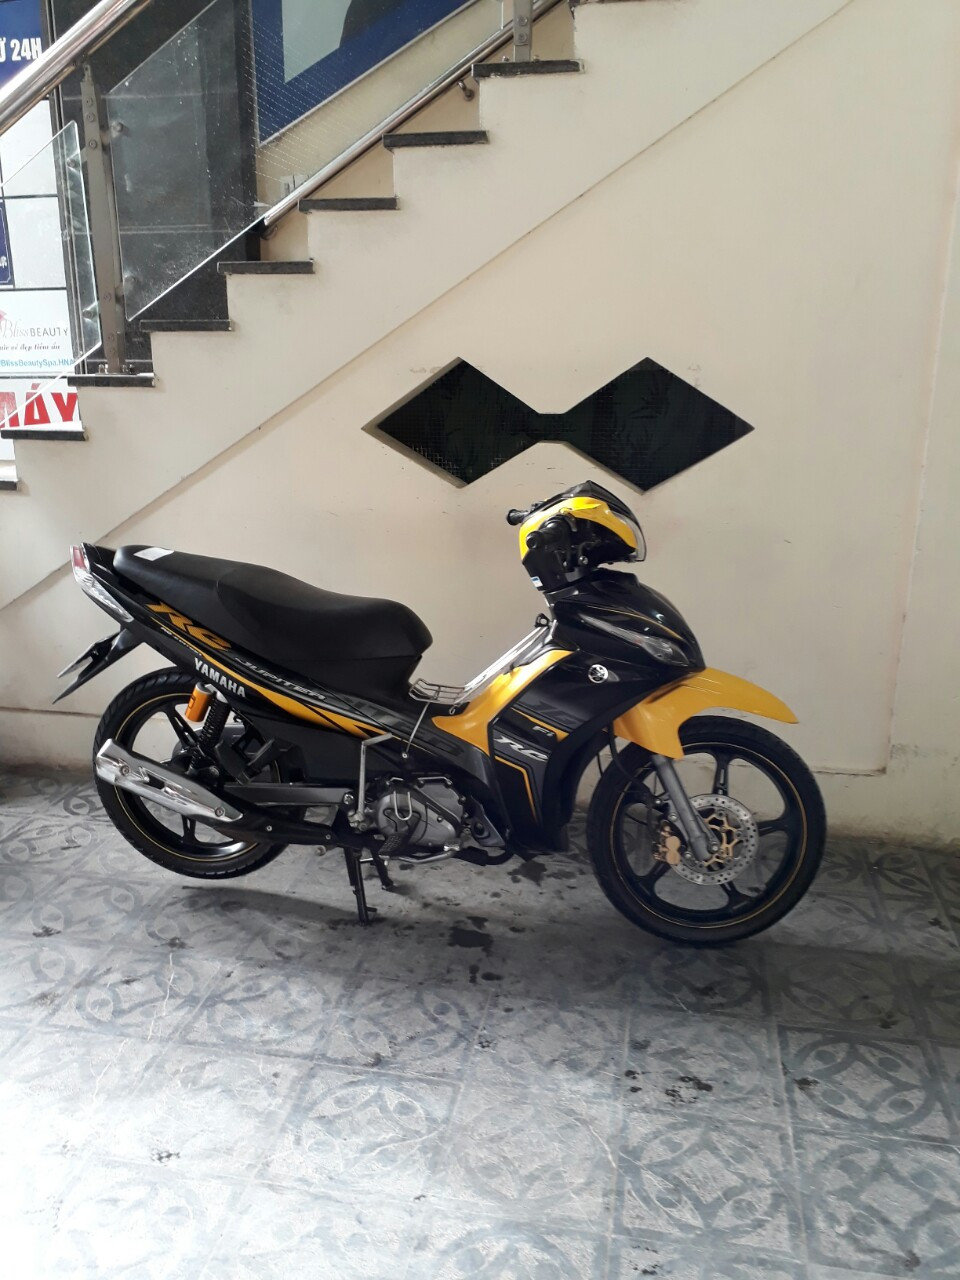 Yamaha Jupiter RC FI vanh duc mot chu di - 2